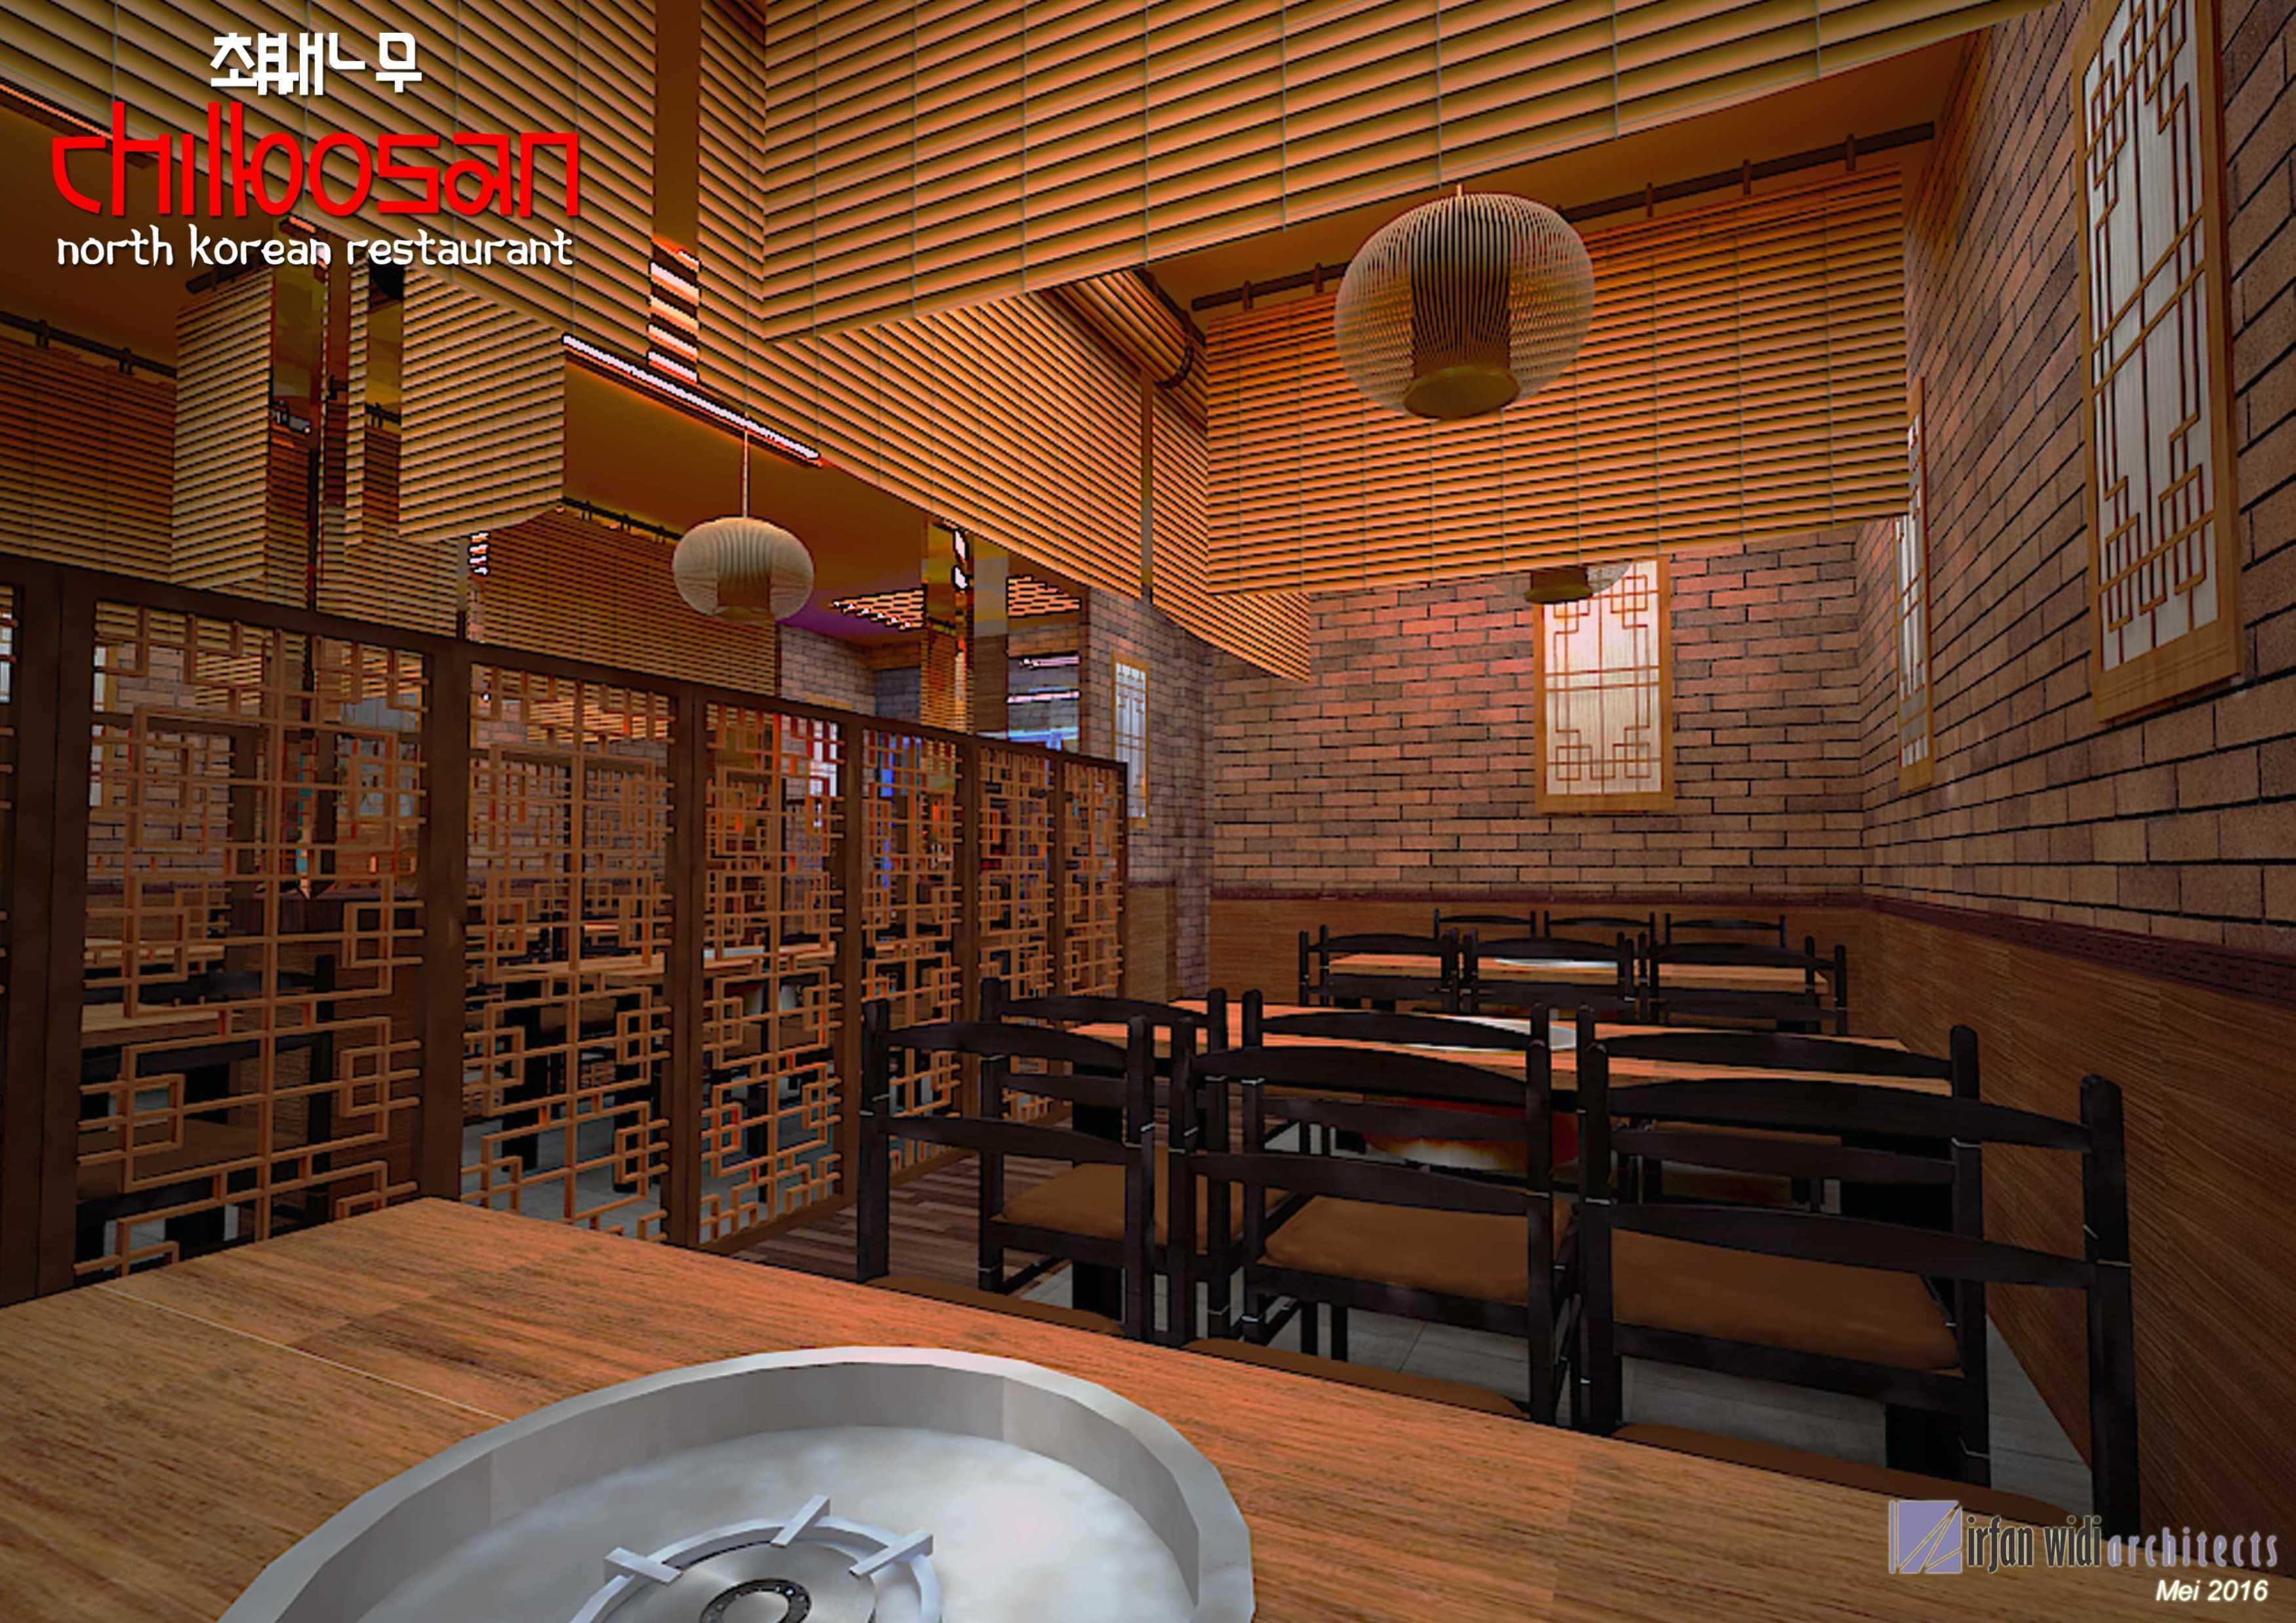 Jeffry Kurniawan Chilbosan Kelapa Gading, Jakarta Kelapa Gading, Jakarta Dining Area   13193